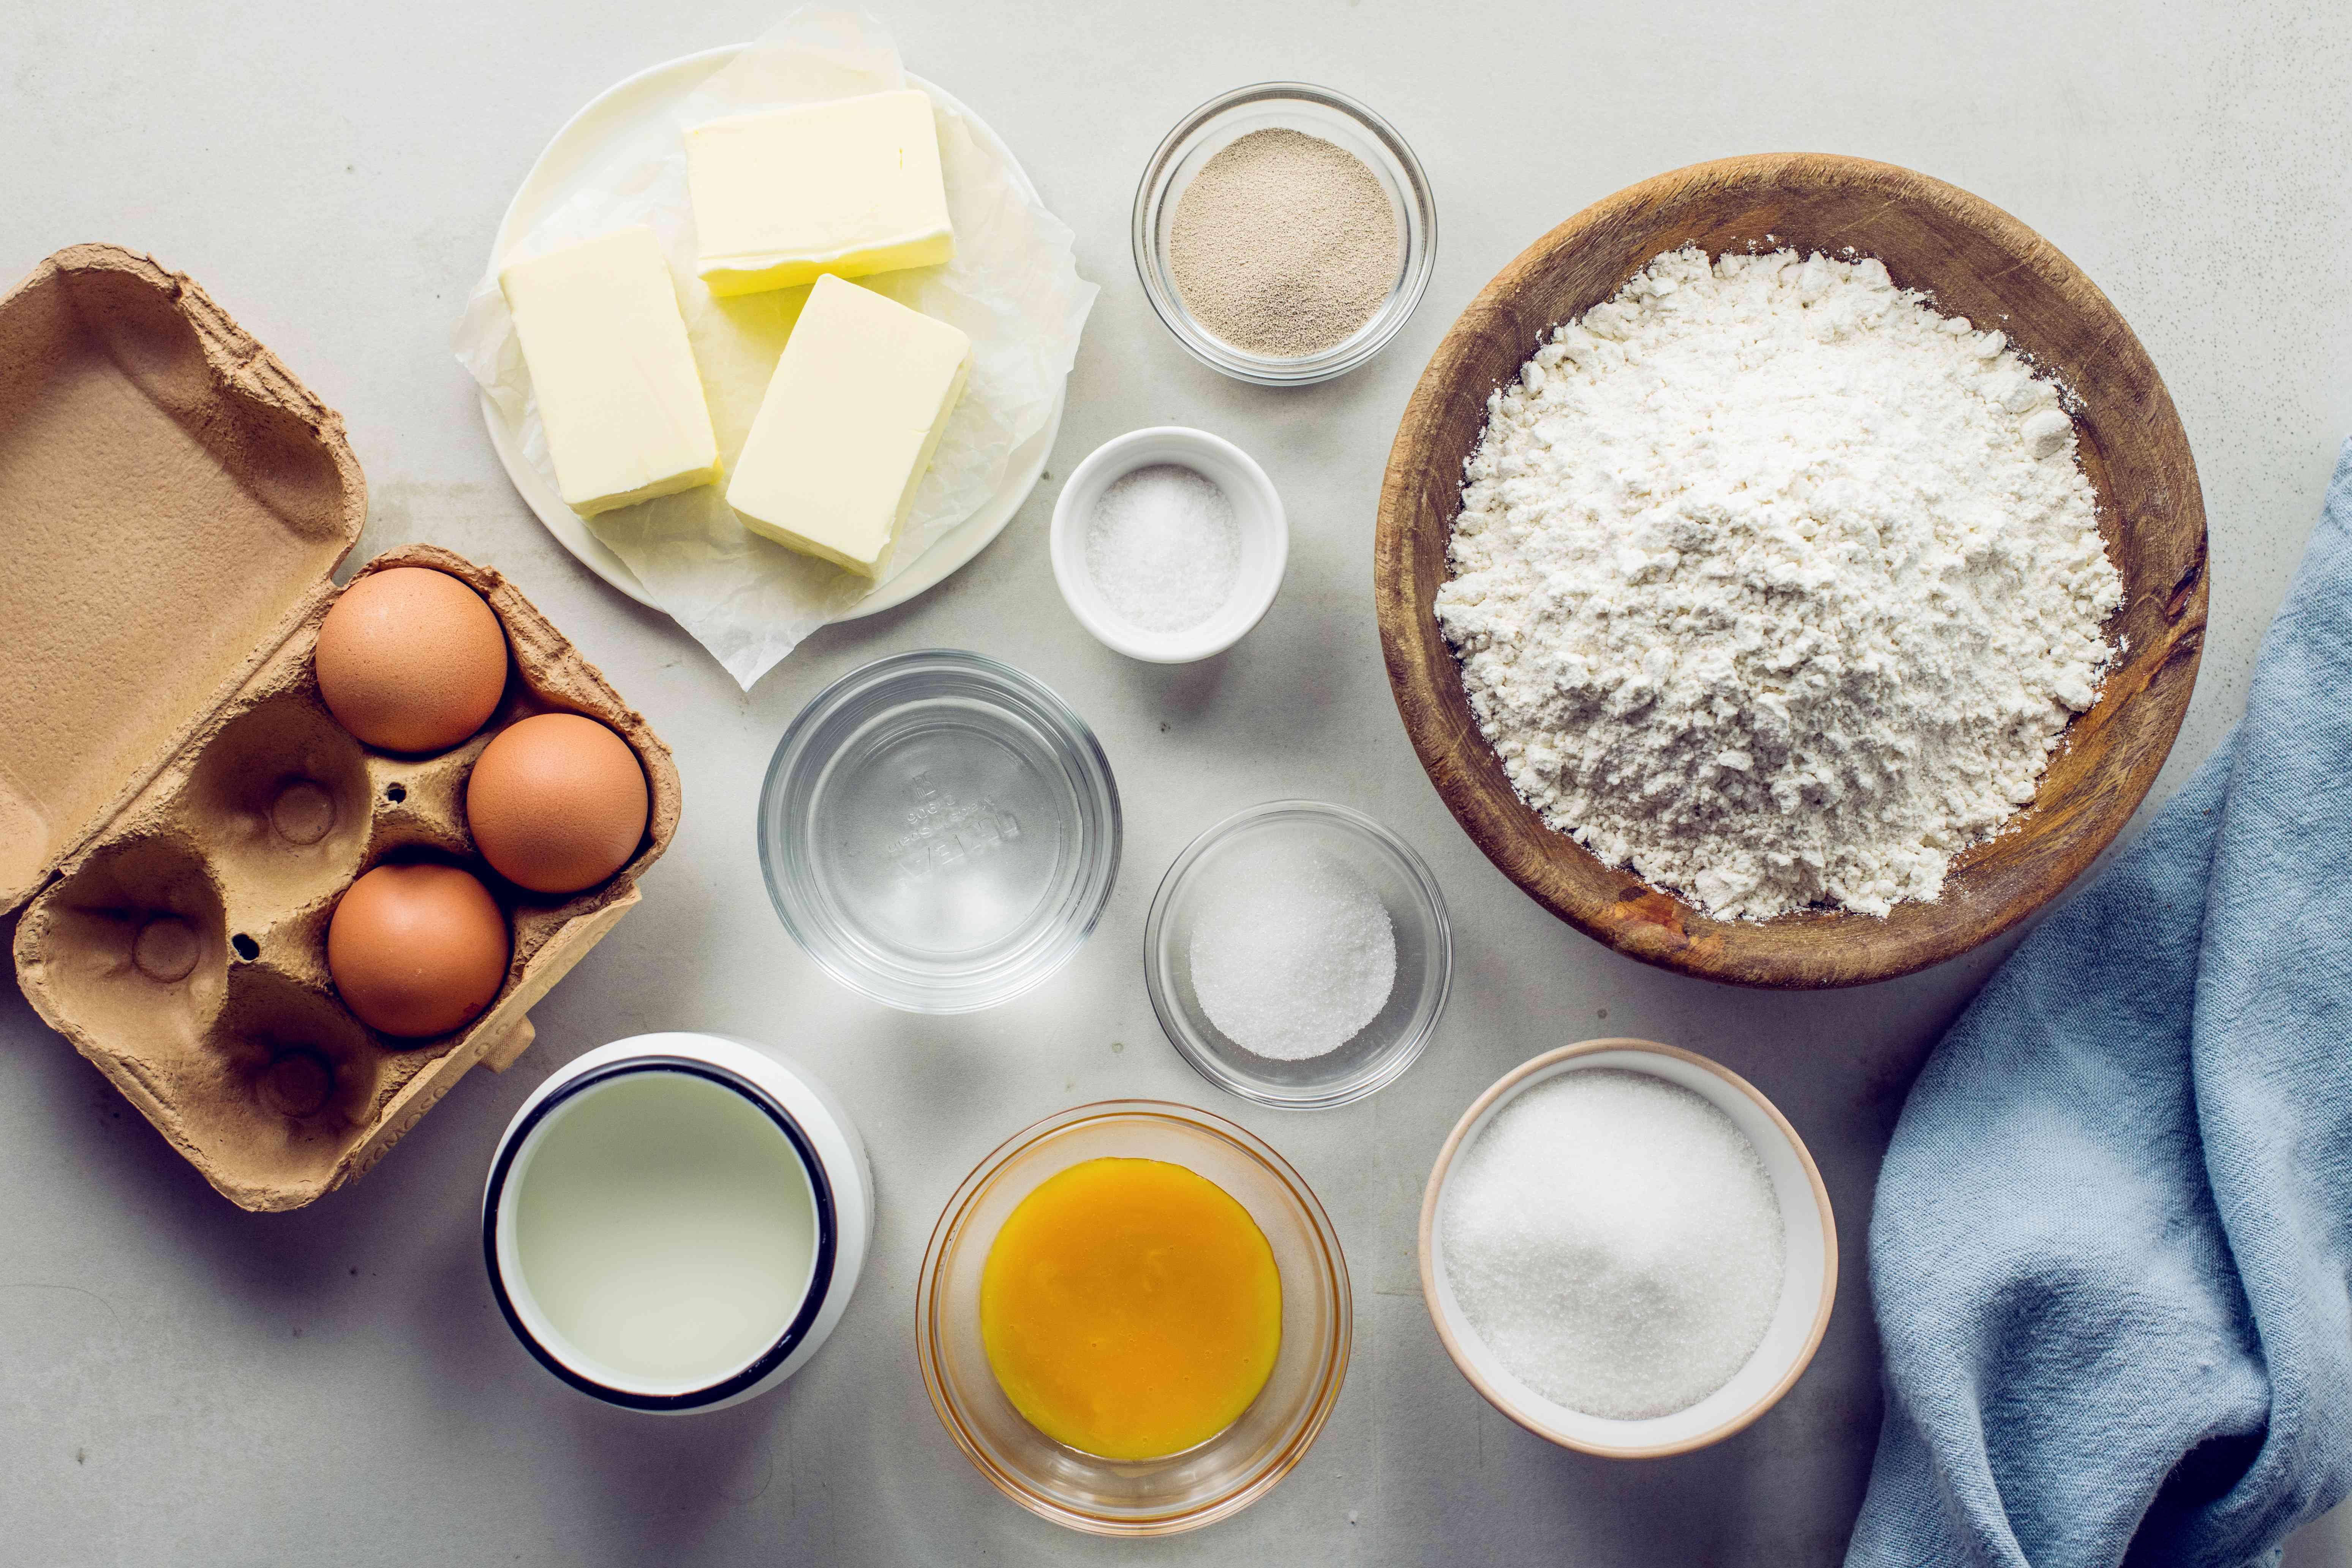 Ingredients for Charlottes slovak Easter bread